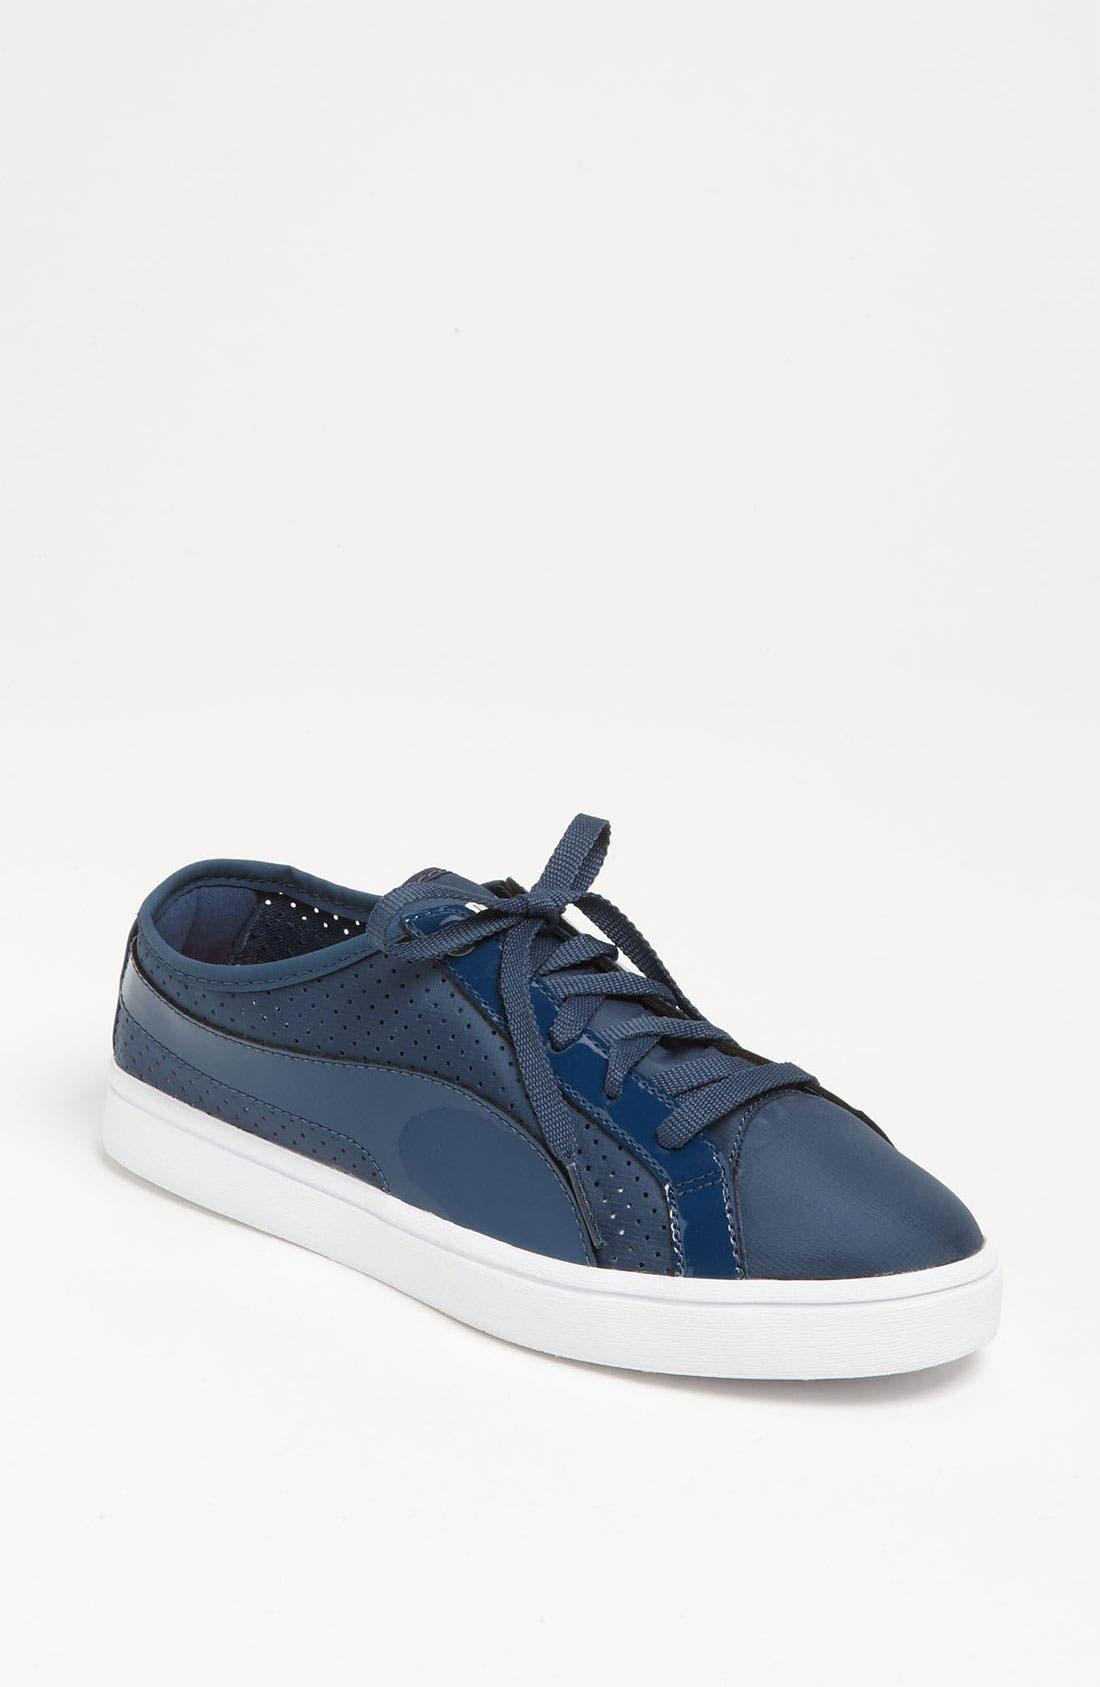 Alternate Image 1 Selected - PUMA 'Kai Lo' Sneaker (Women)